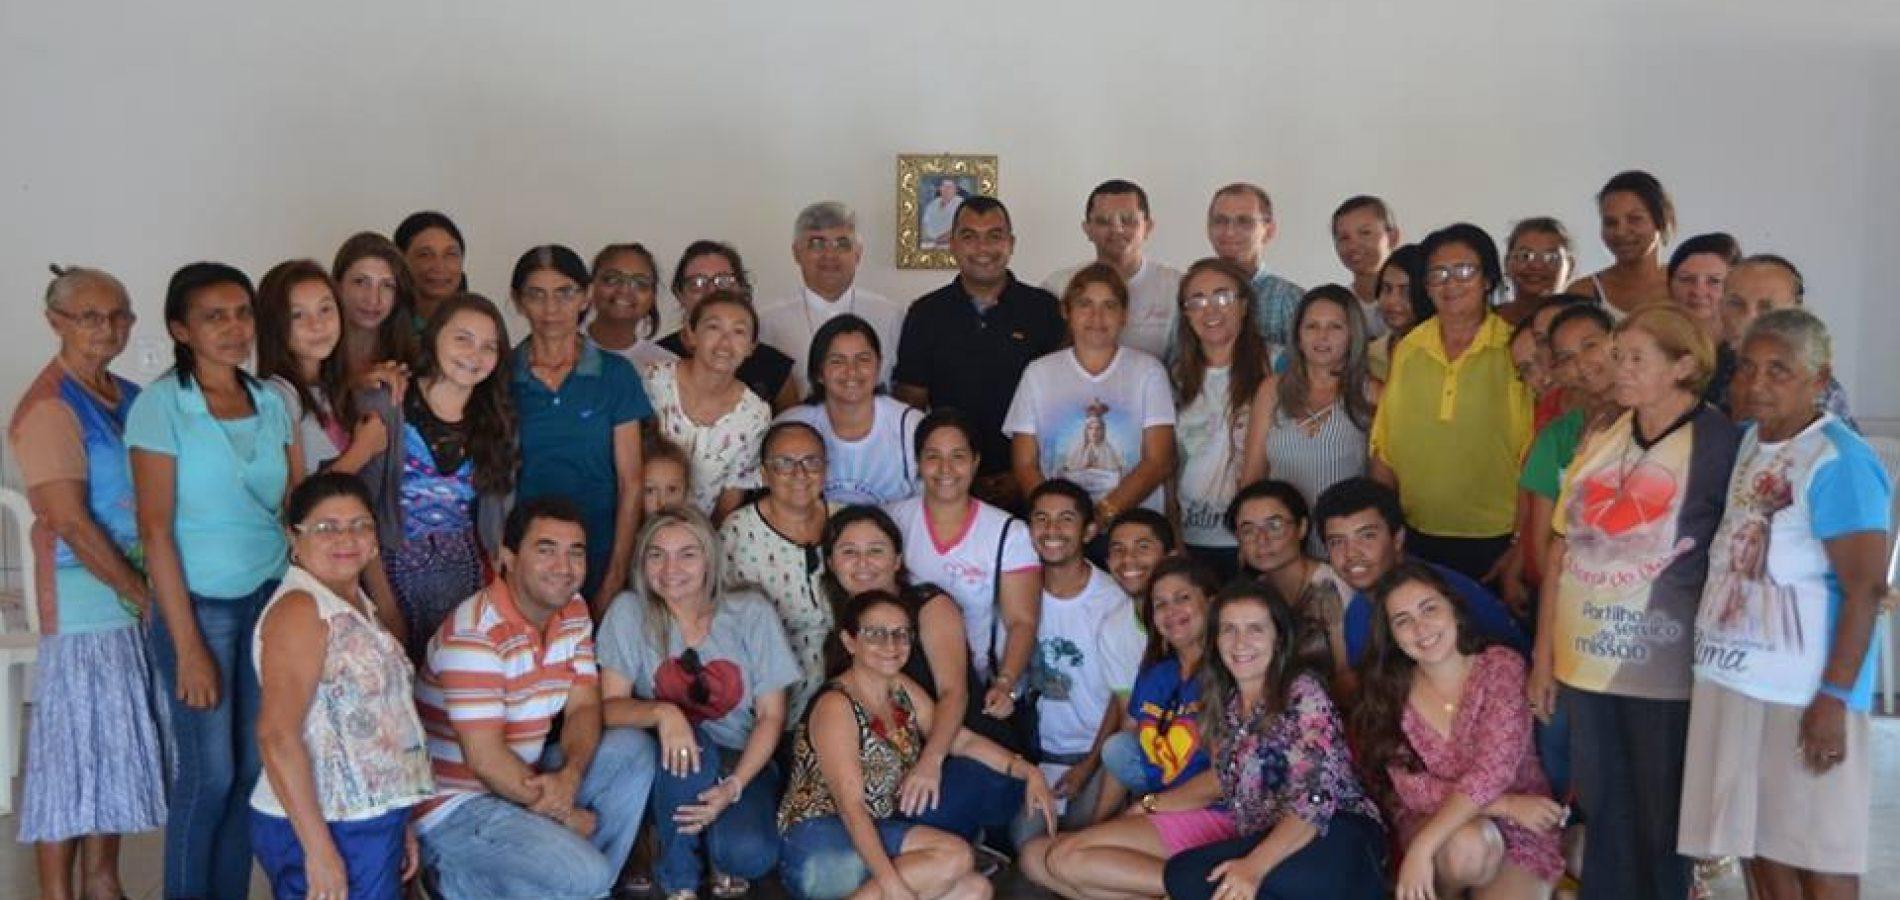 Alegrete do Piauí vai receber seminaristas para estágio pastoral